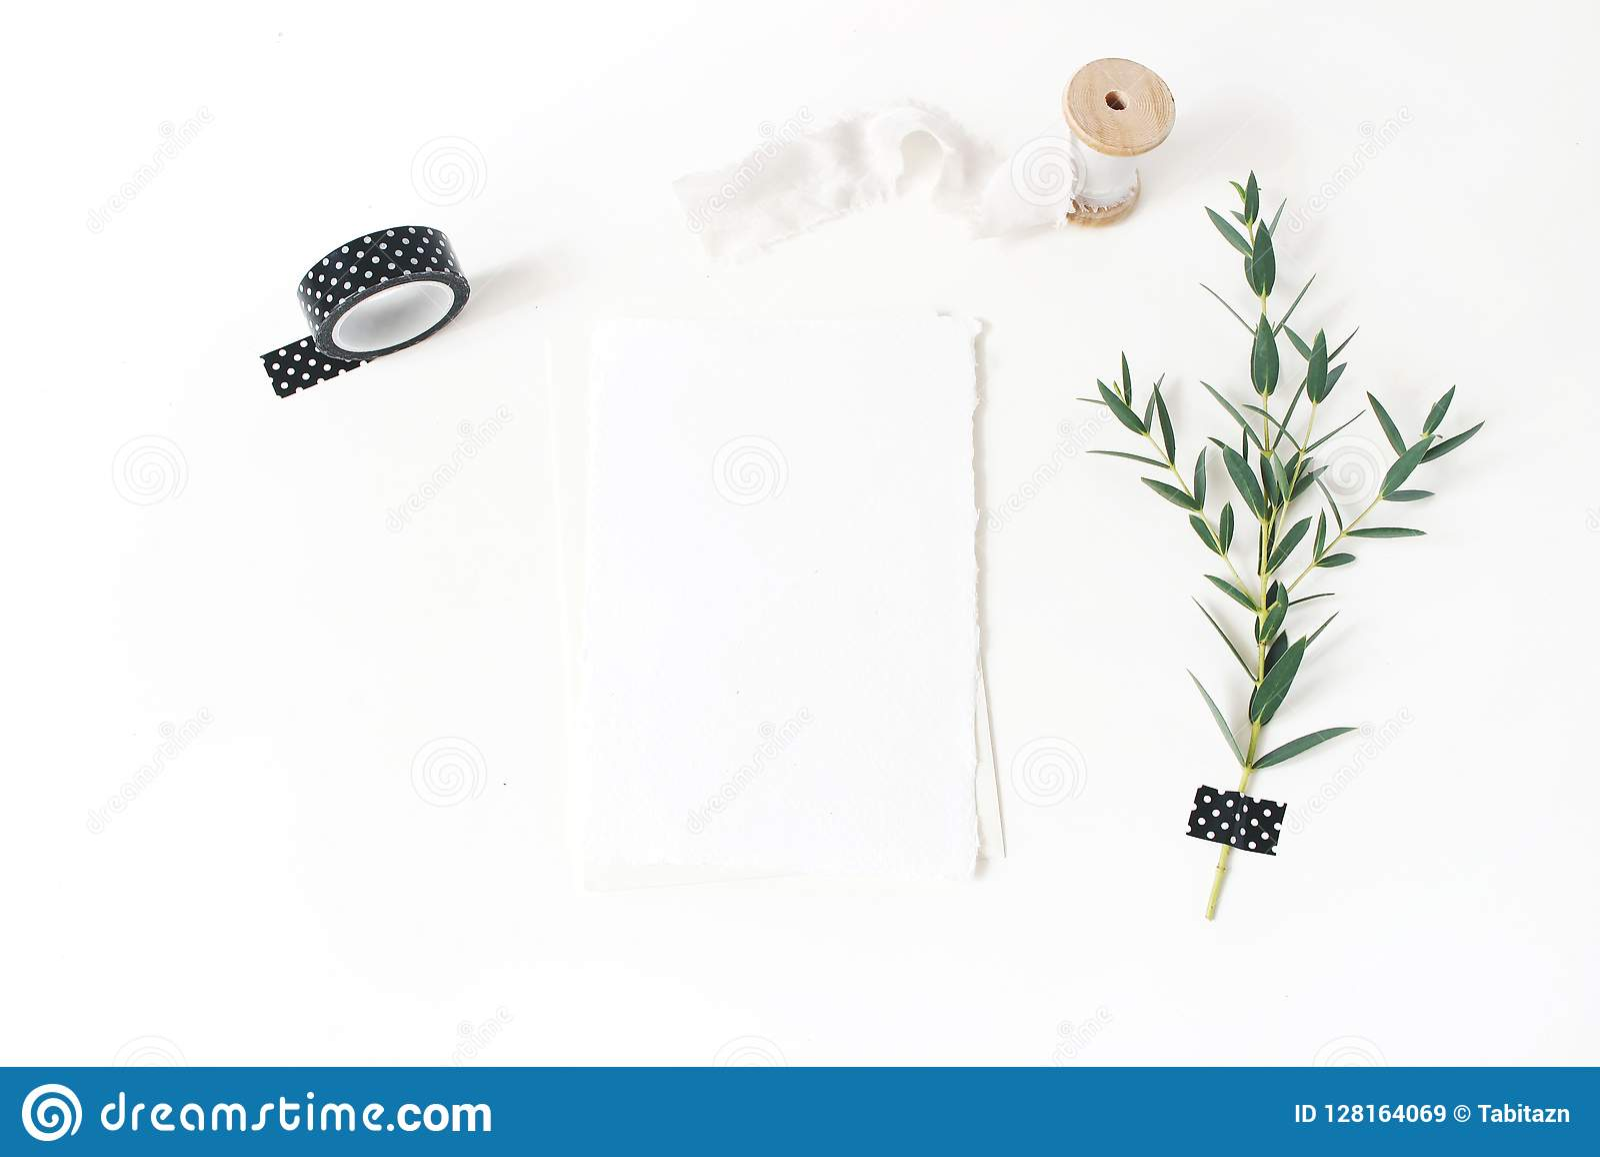 Feminine stationery, wedding desktop mock-up scene. Blank greeting card, envelope,black washi tape, silk ribbon and